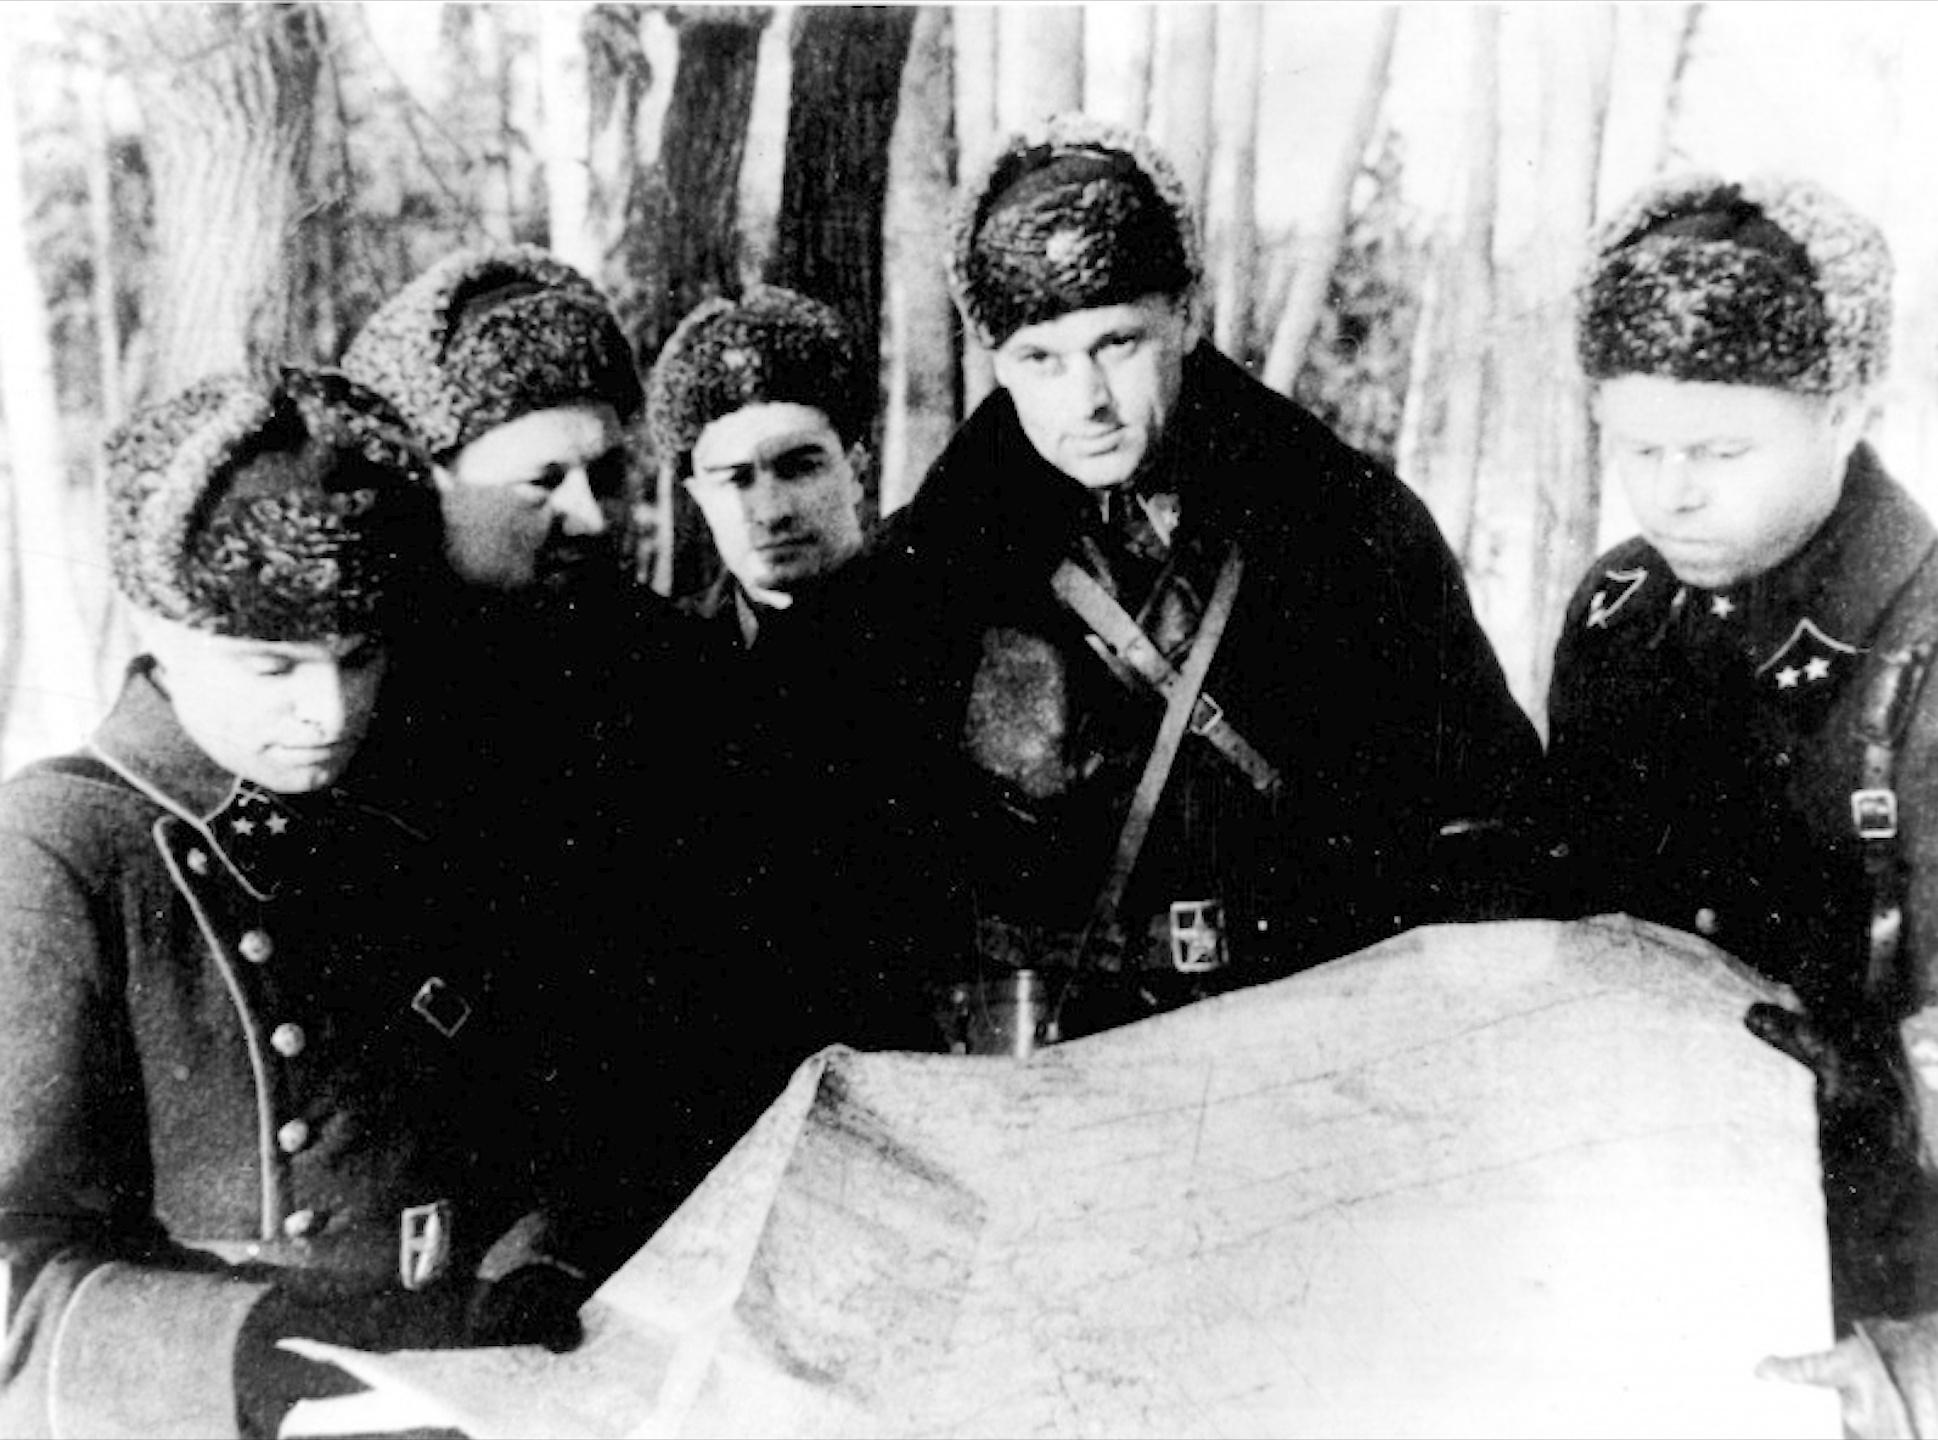 rokossovskii-bitva-za-mostvu1-png